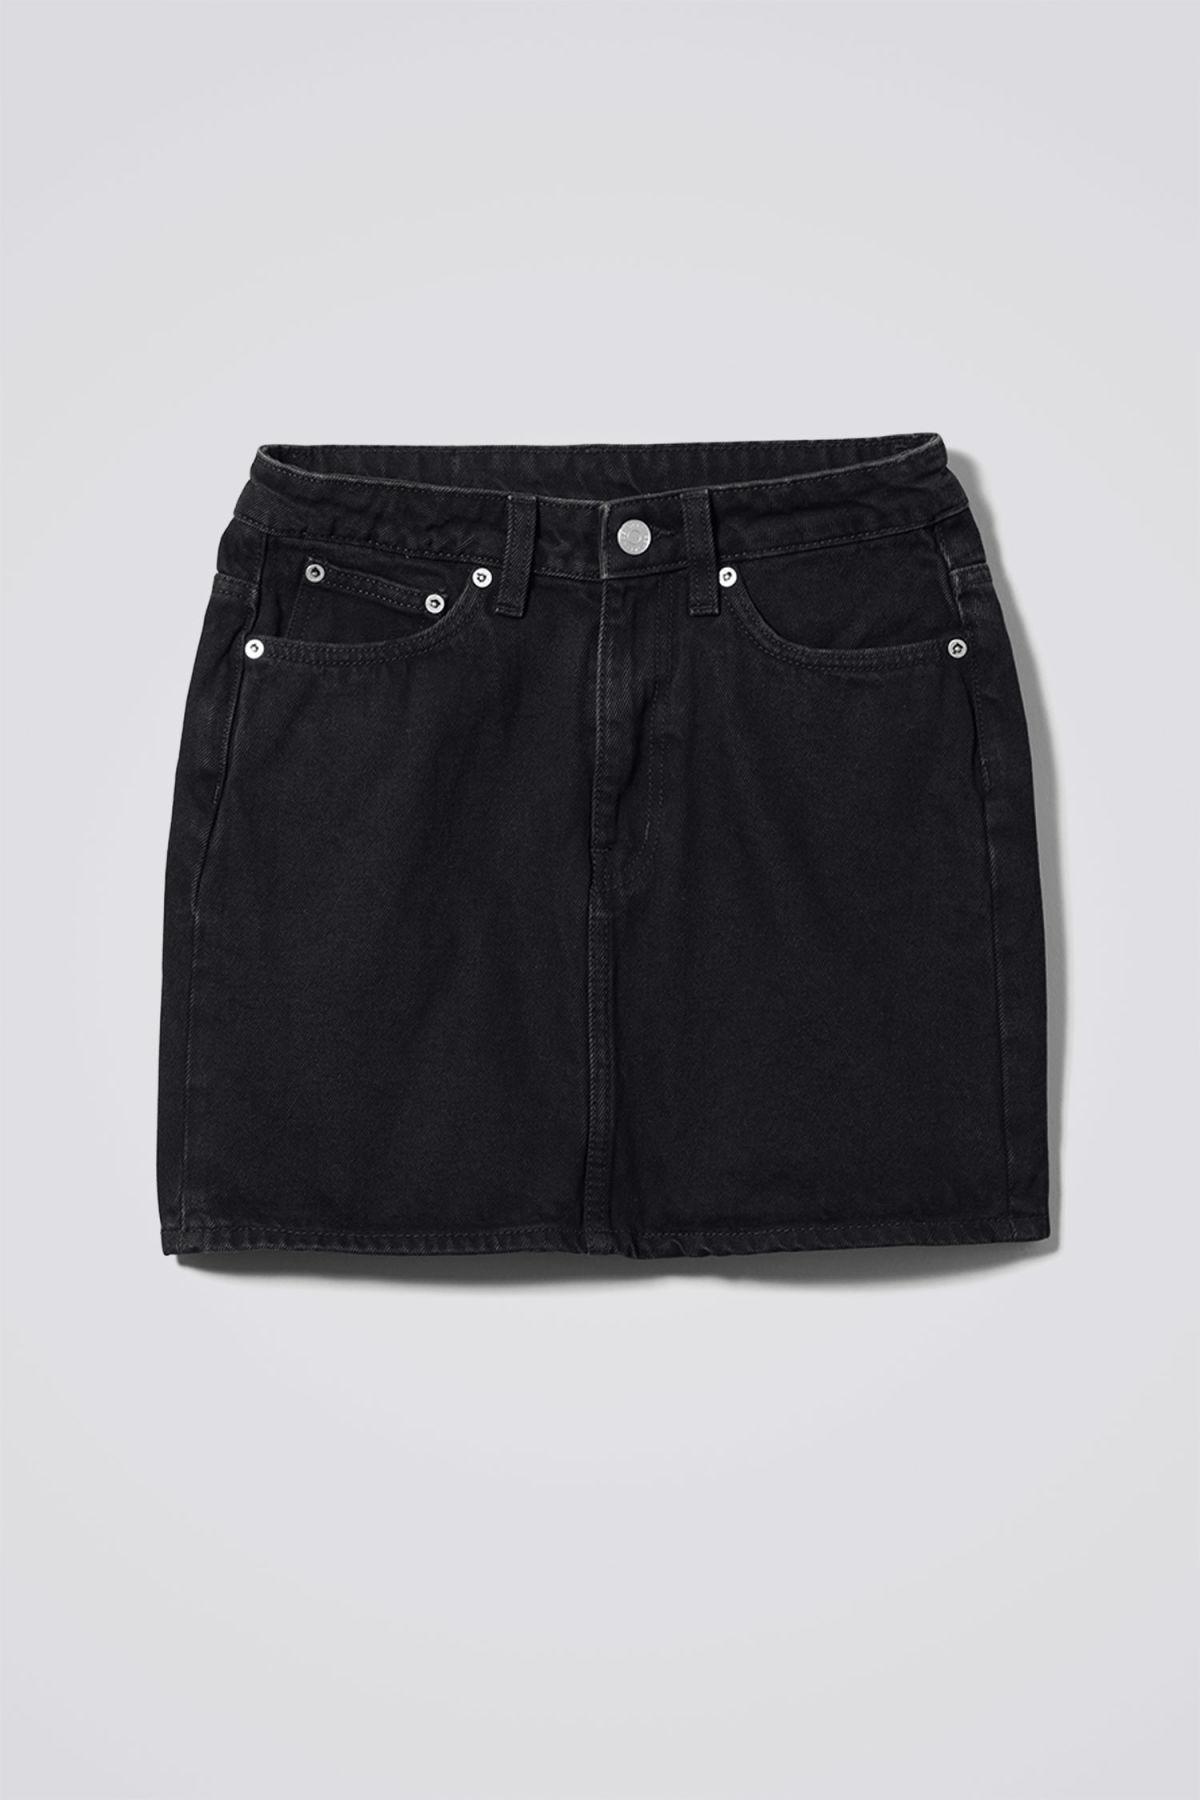 Wend Denim Tuned Black Skirt - Black